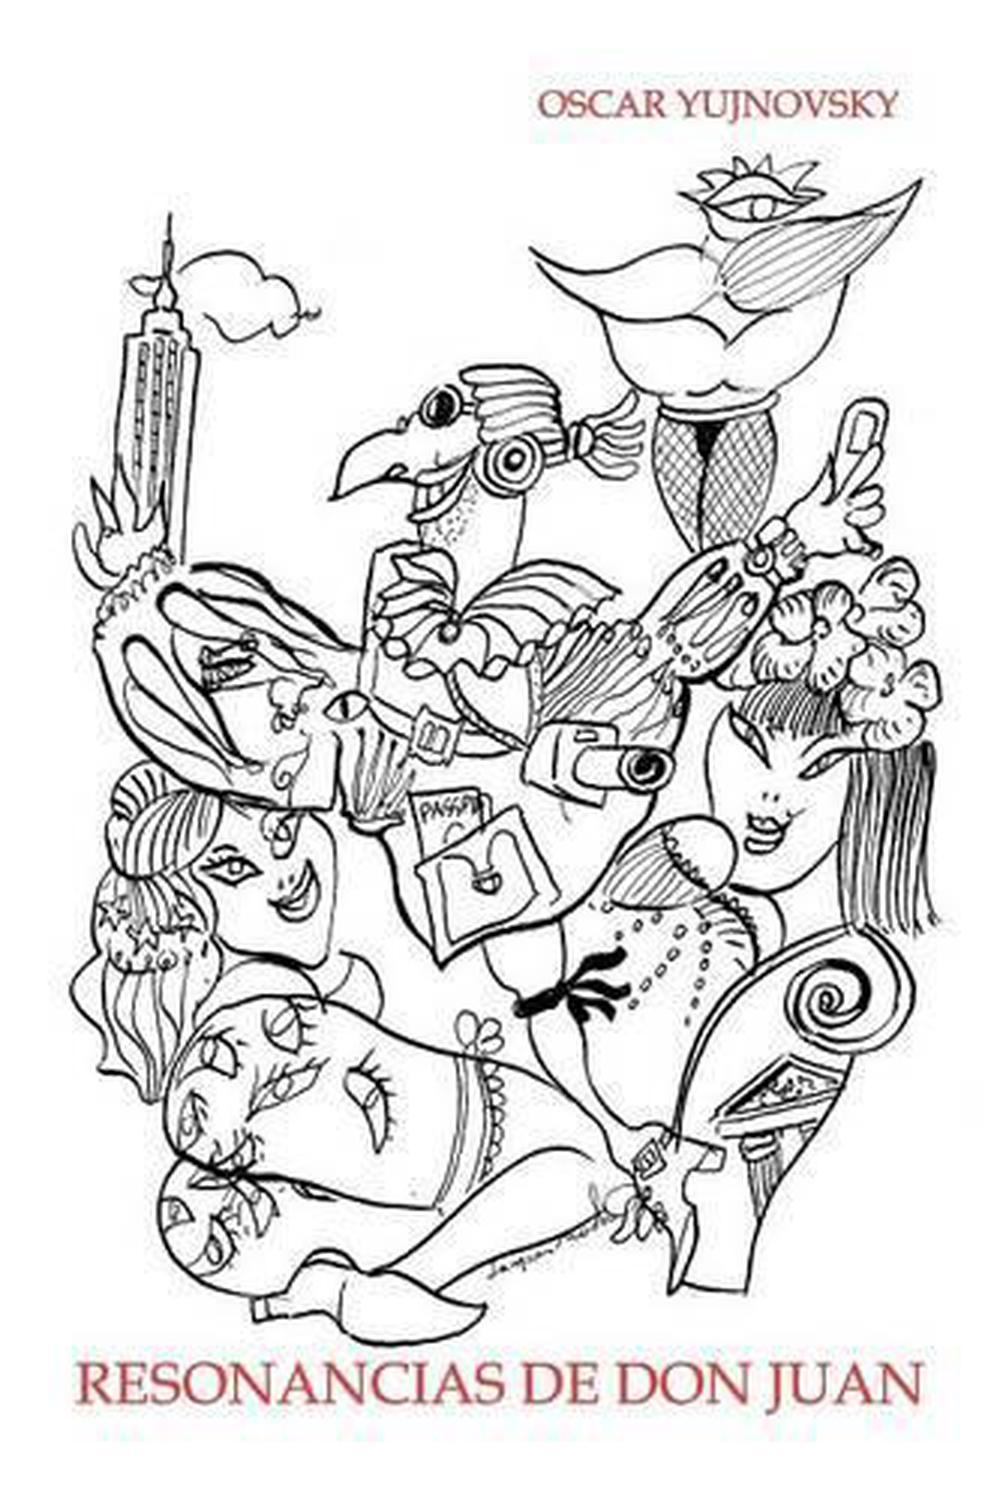 Resonancias de Don Juan by Oscar Yujnovsky (Spanish